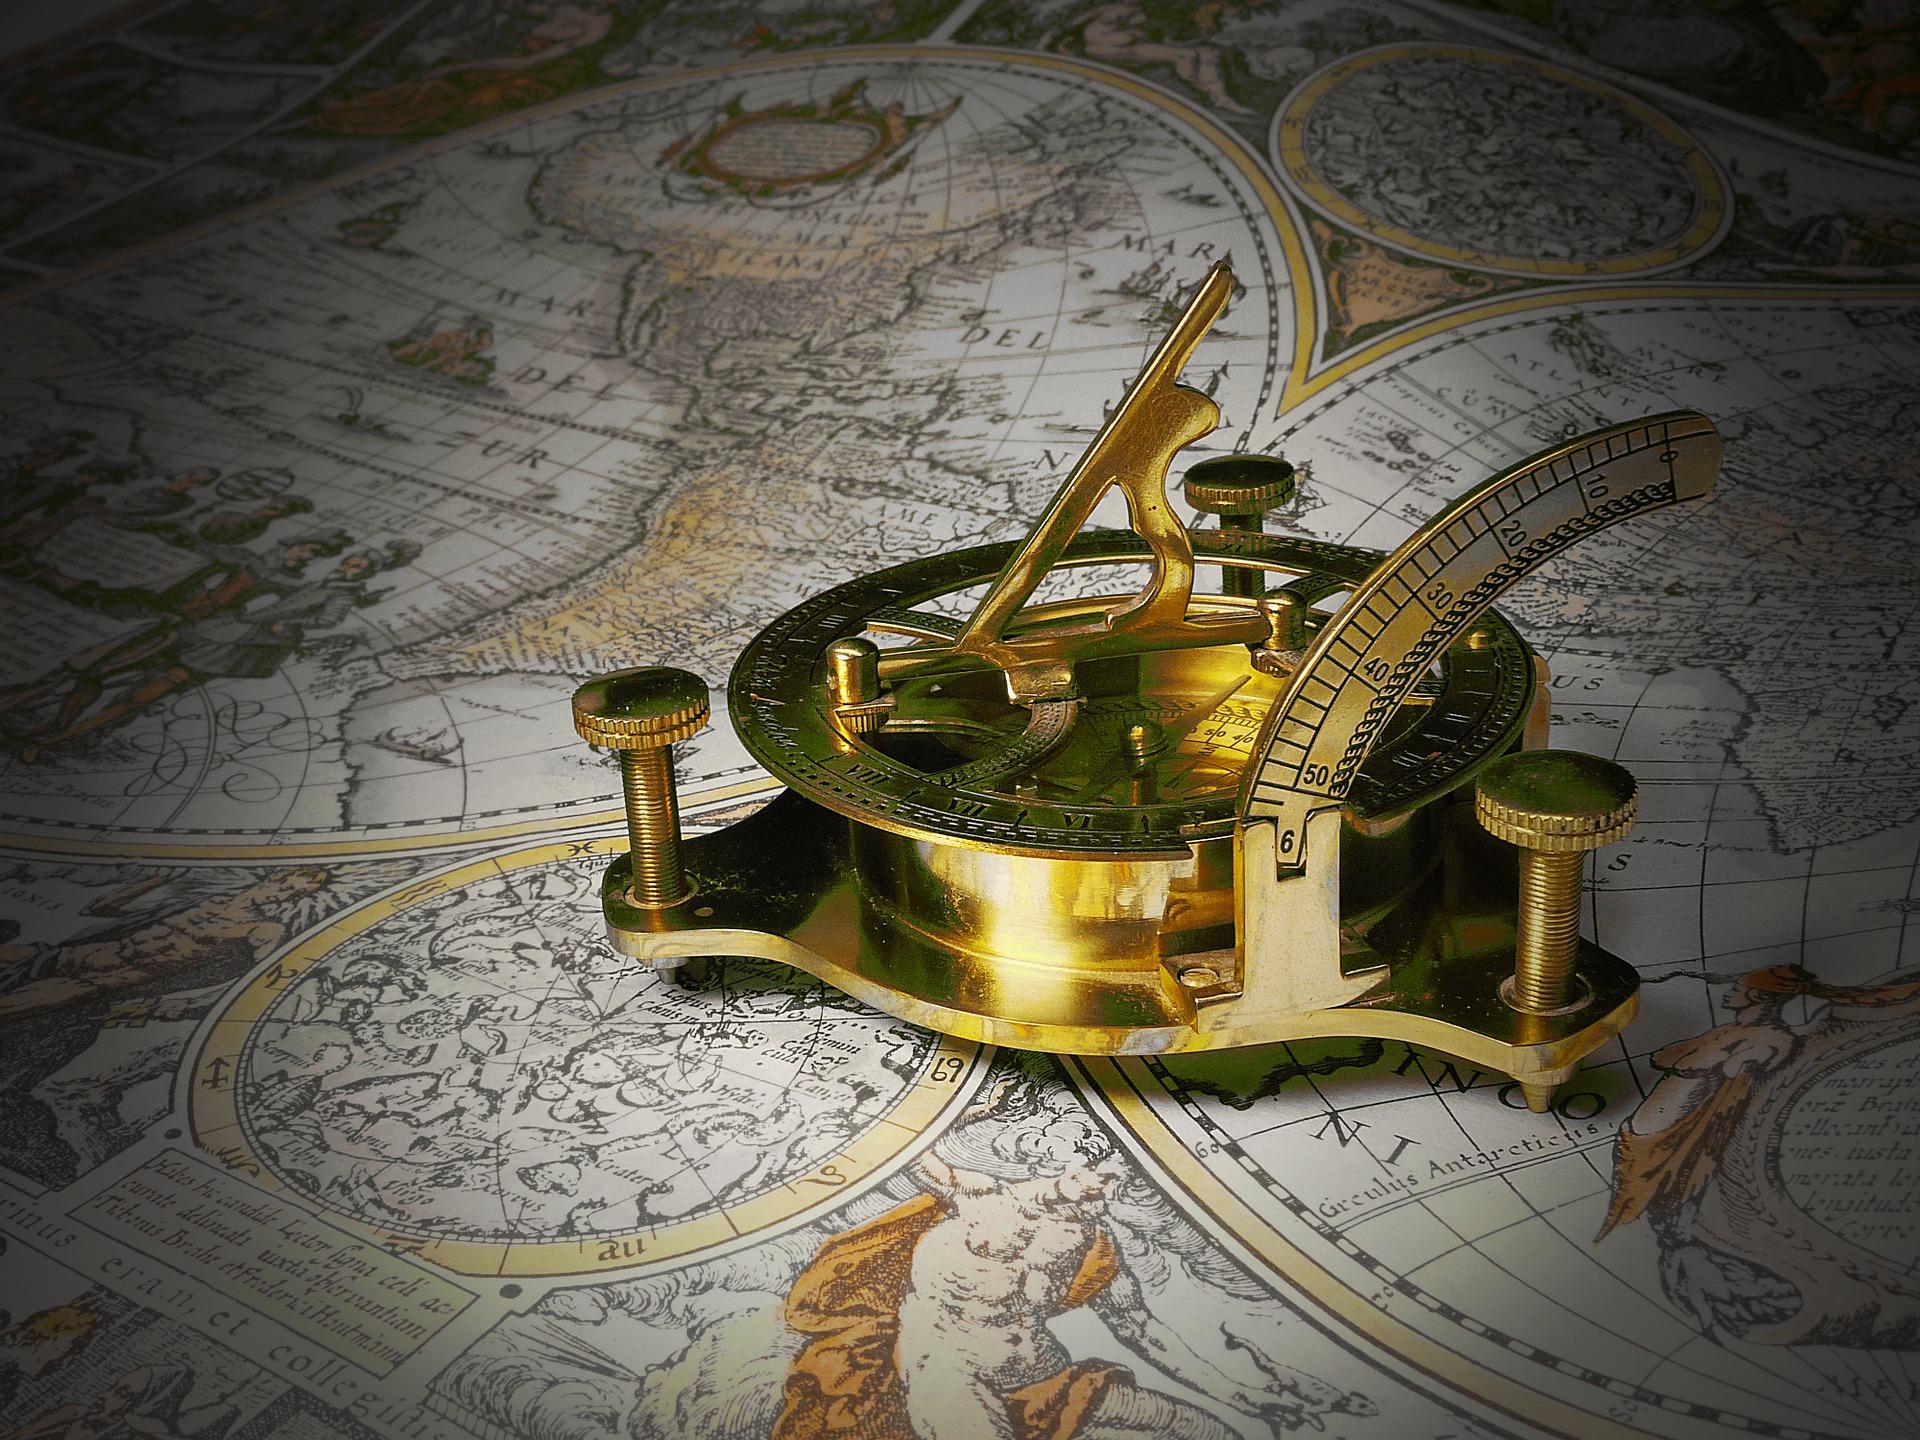 Uhr, Sonnenuhr, Caliber, Karte, Geographie, Dorado - Wallpaper HD - Prof.-falken.com